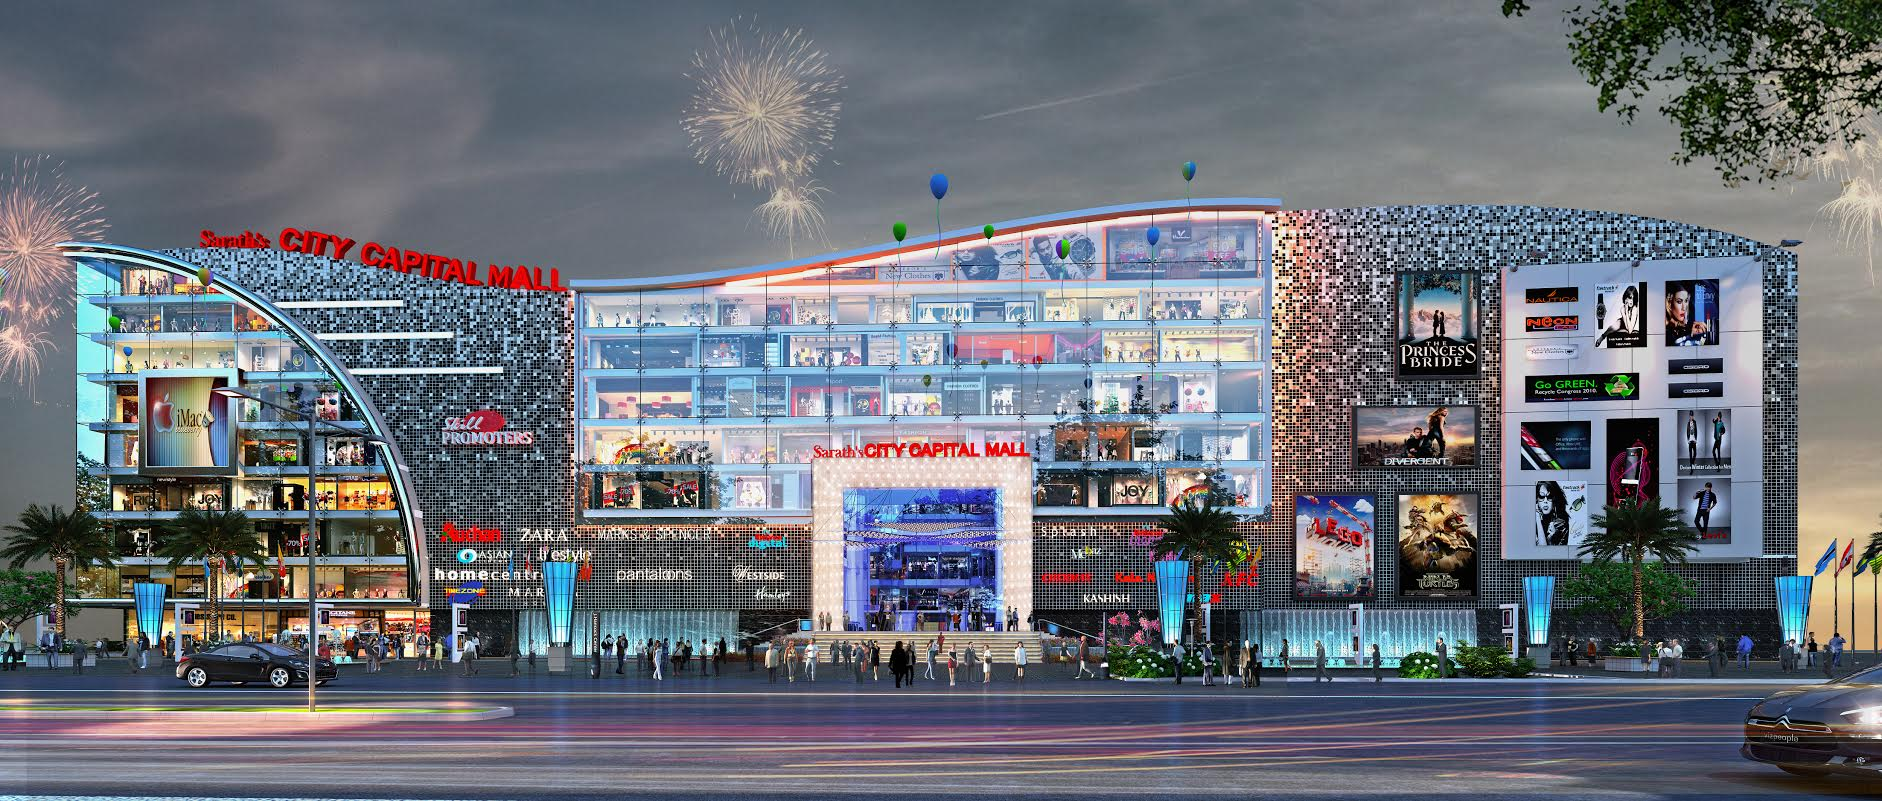 Sarath City Capital Mall